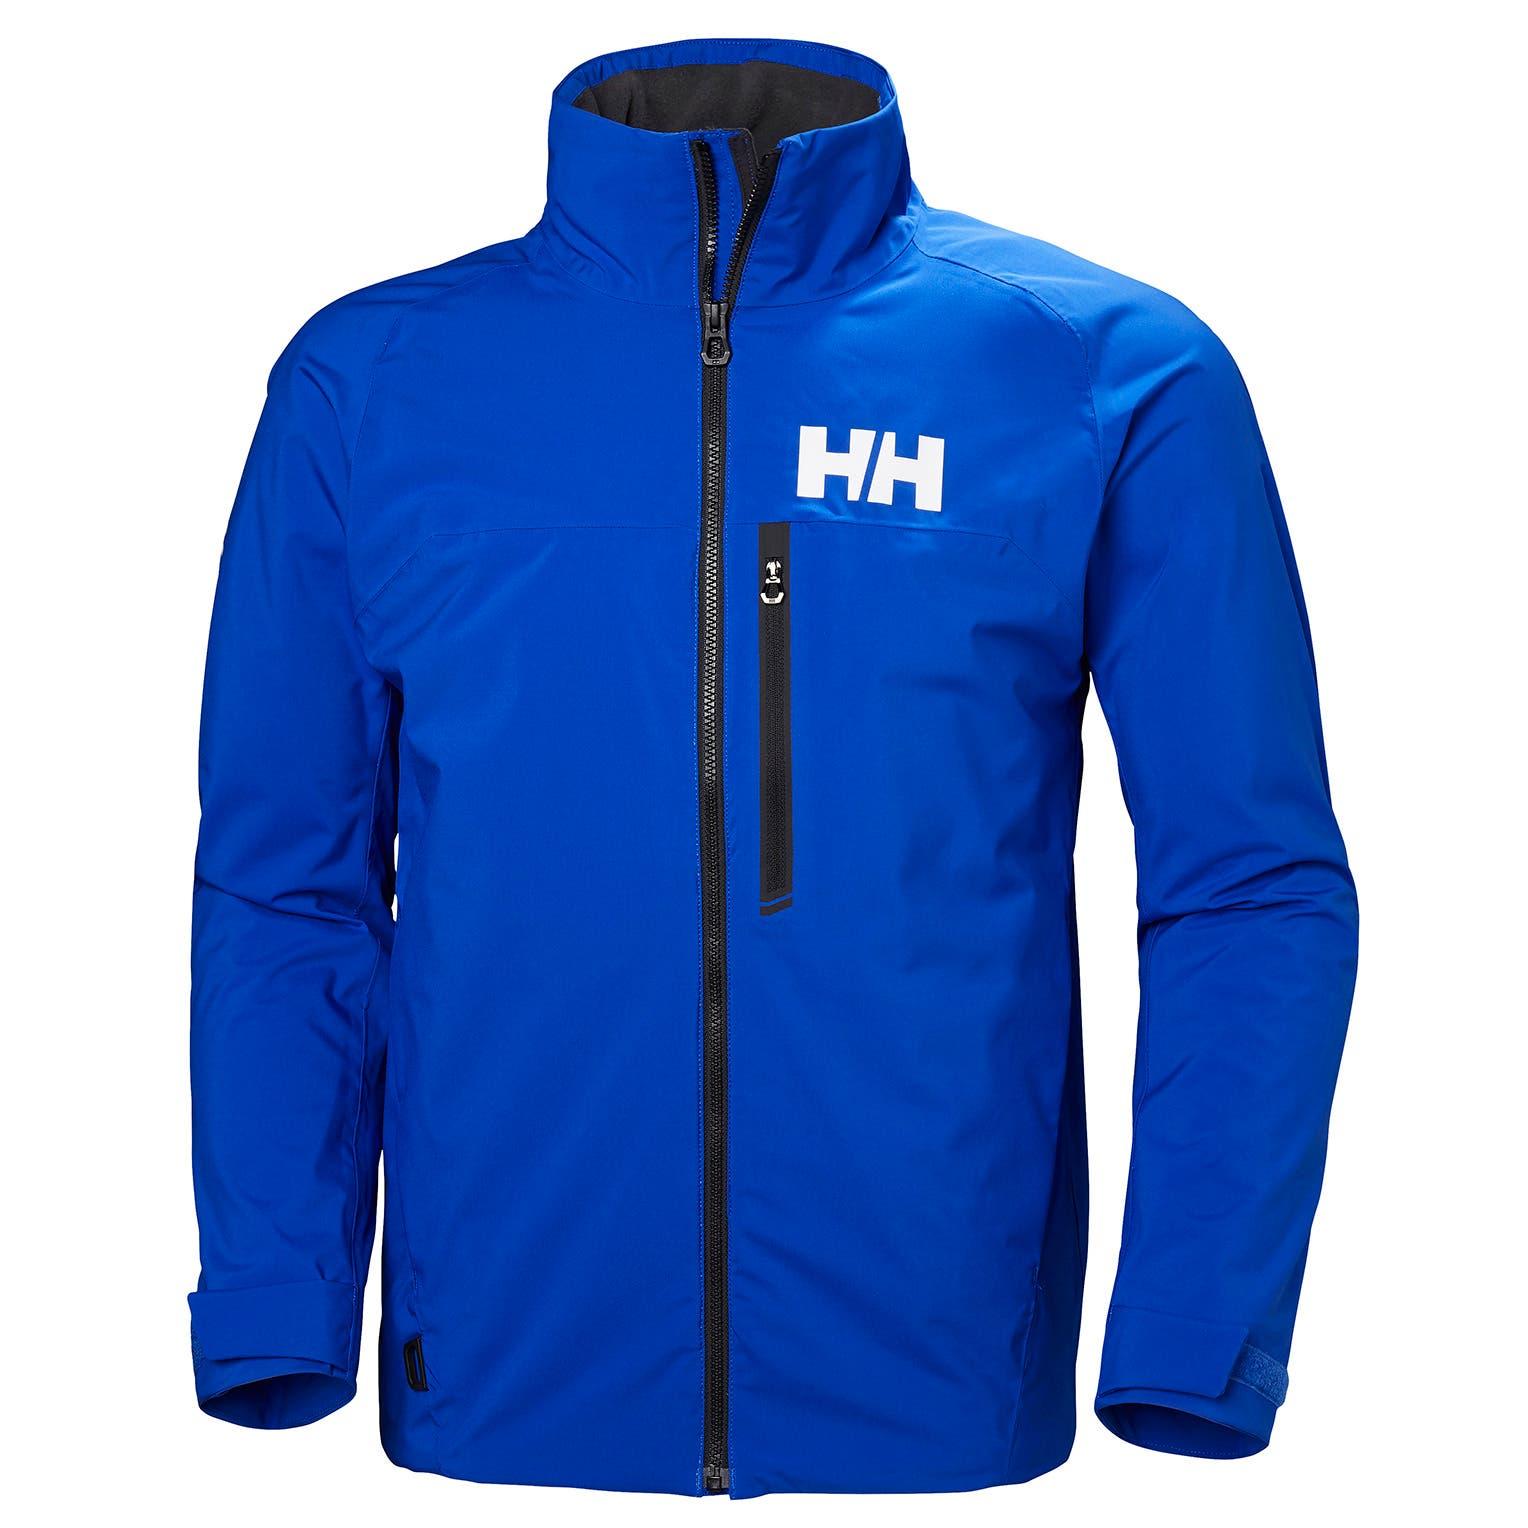 Helly Hansen HP Racing Midlayer Jacket (34041)